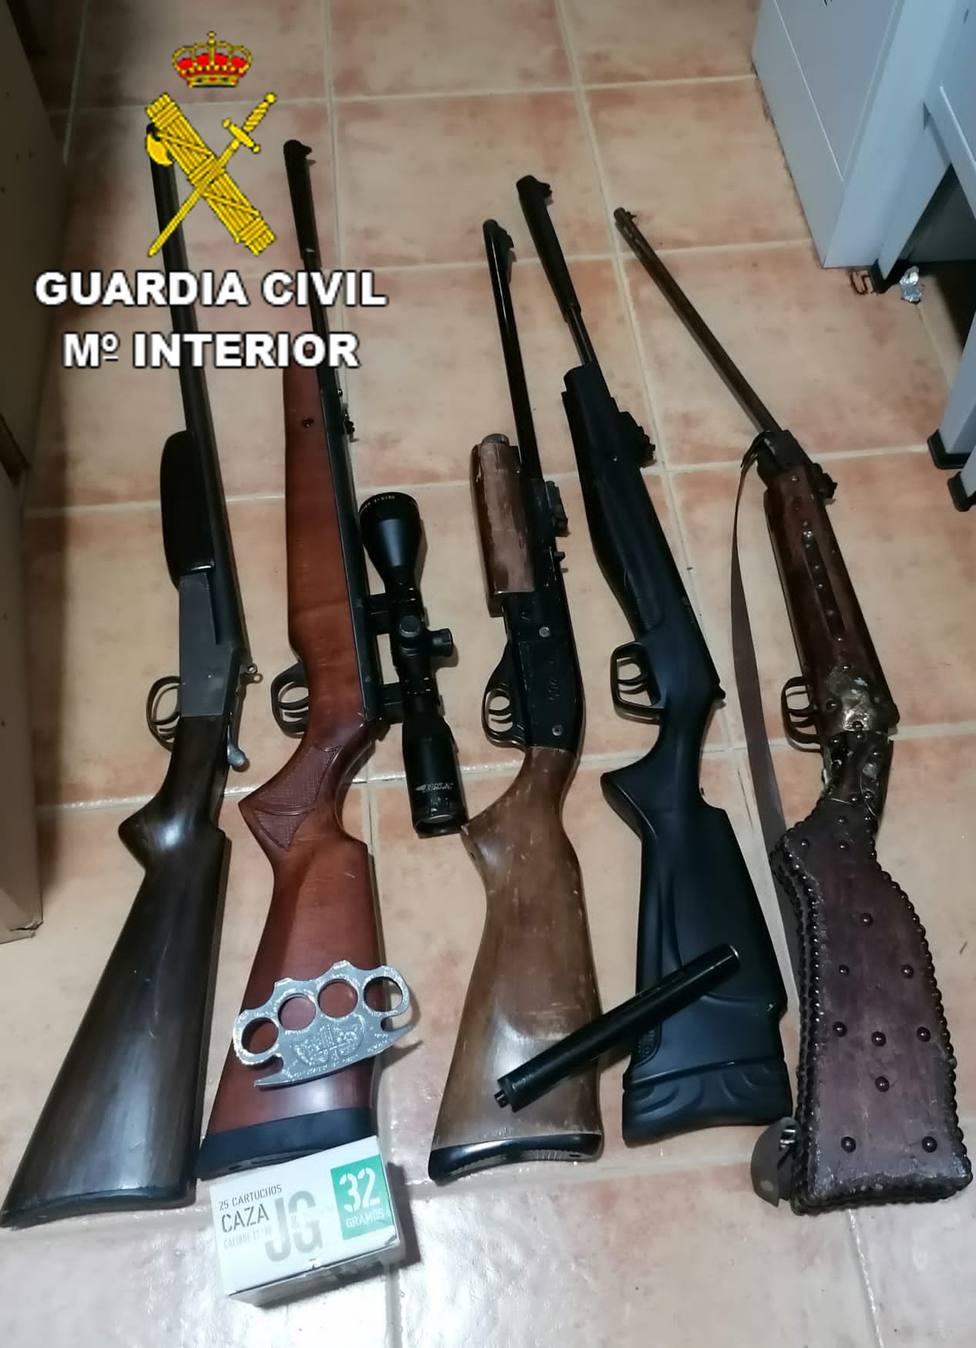 ctv-jkj-los-navalmorales--armas